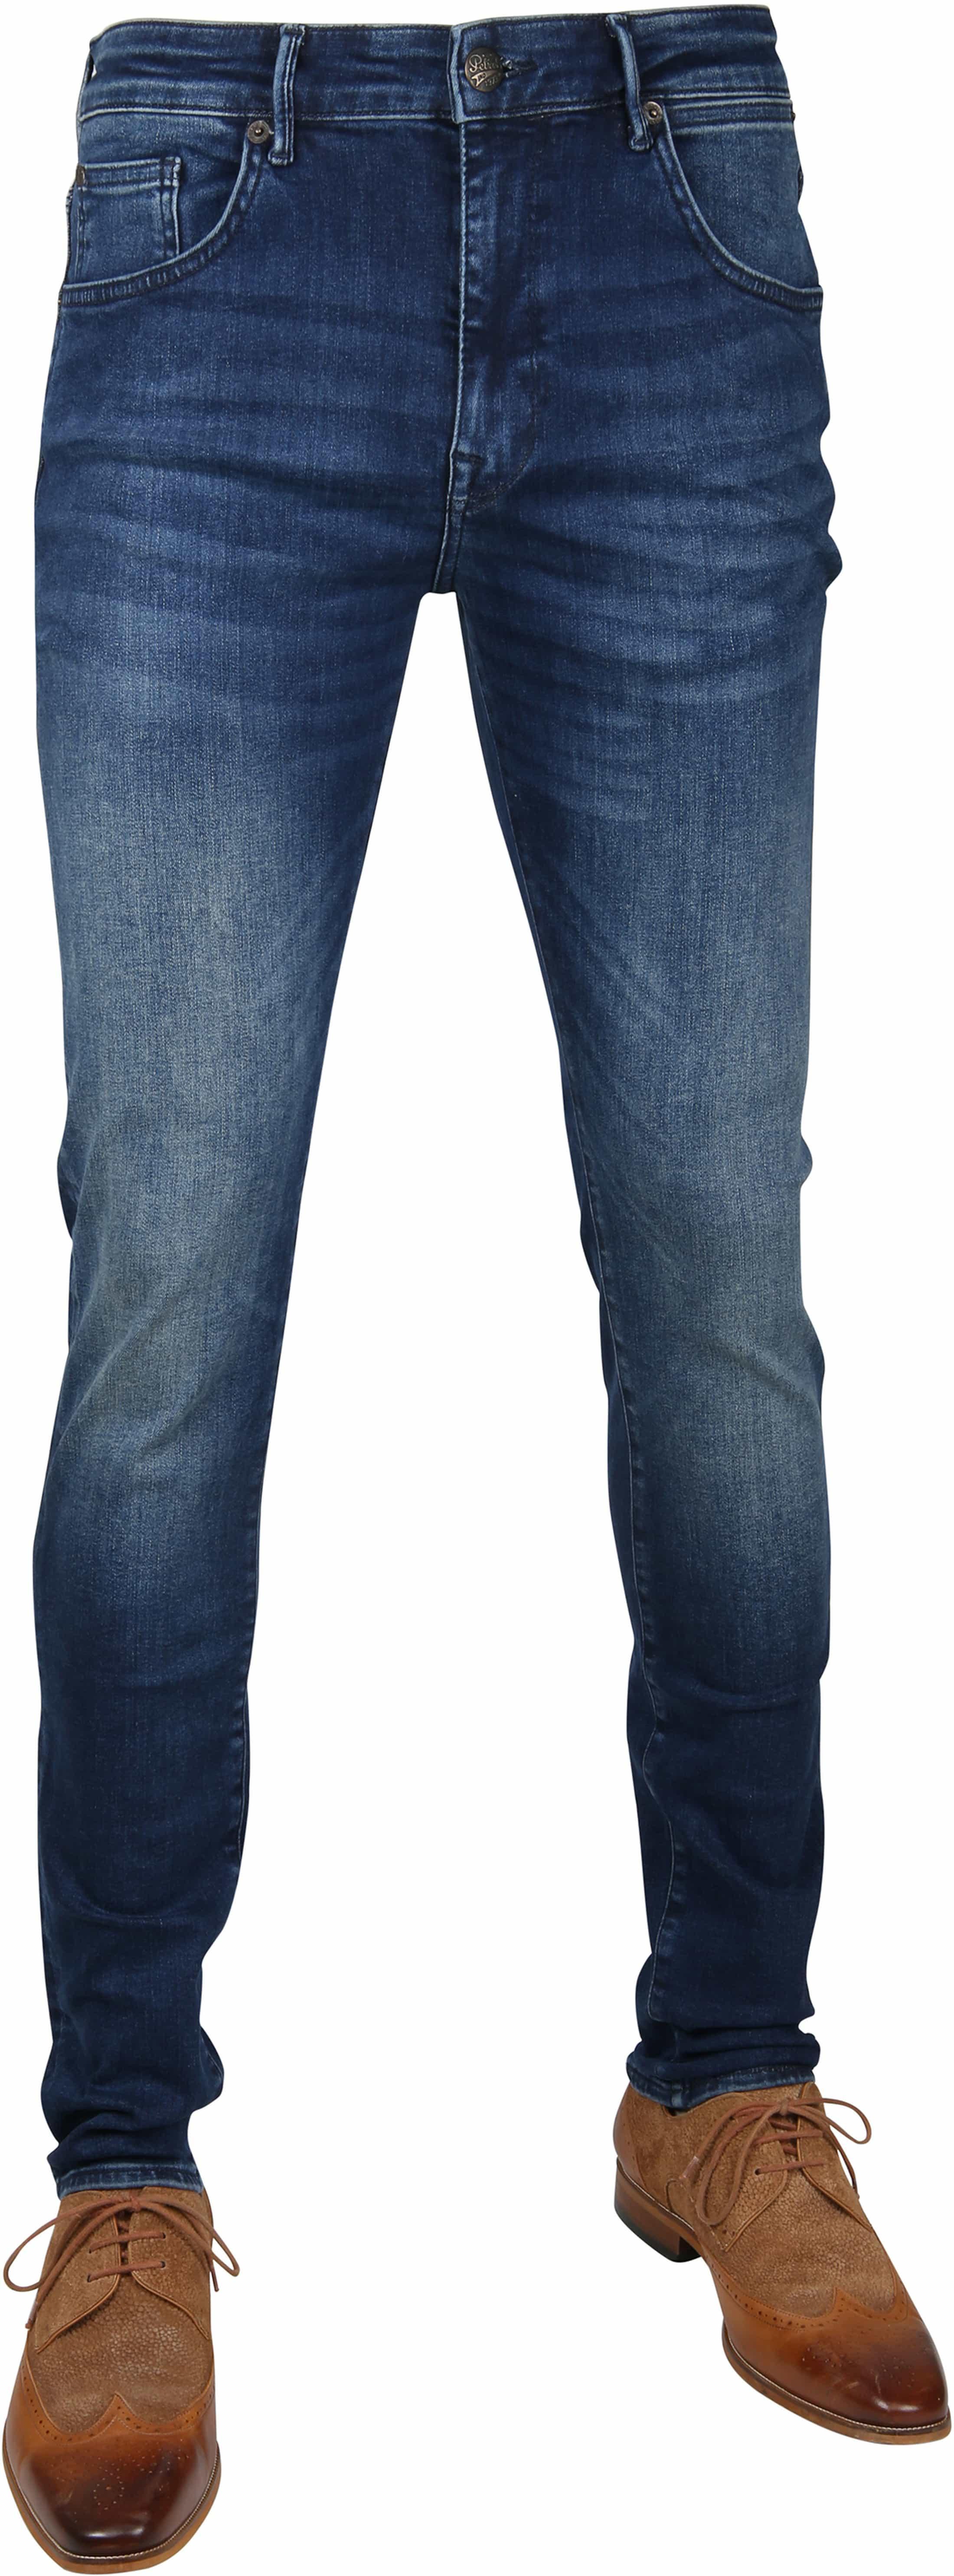 Petrol Seaham Jeans Blau Foto 0